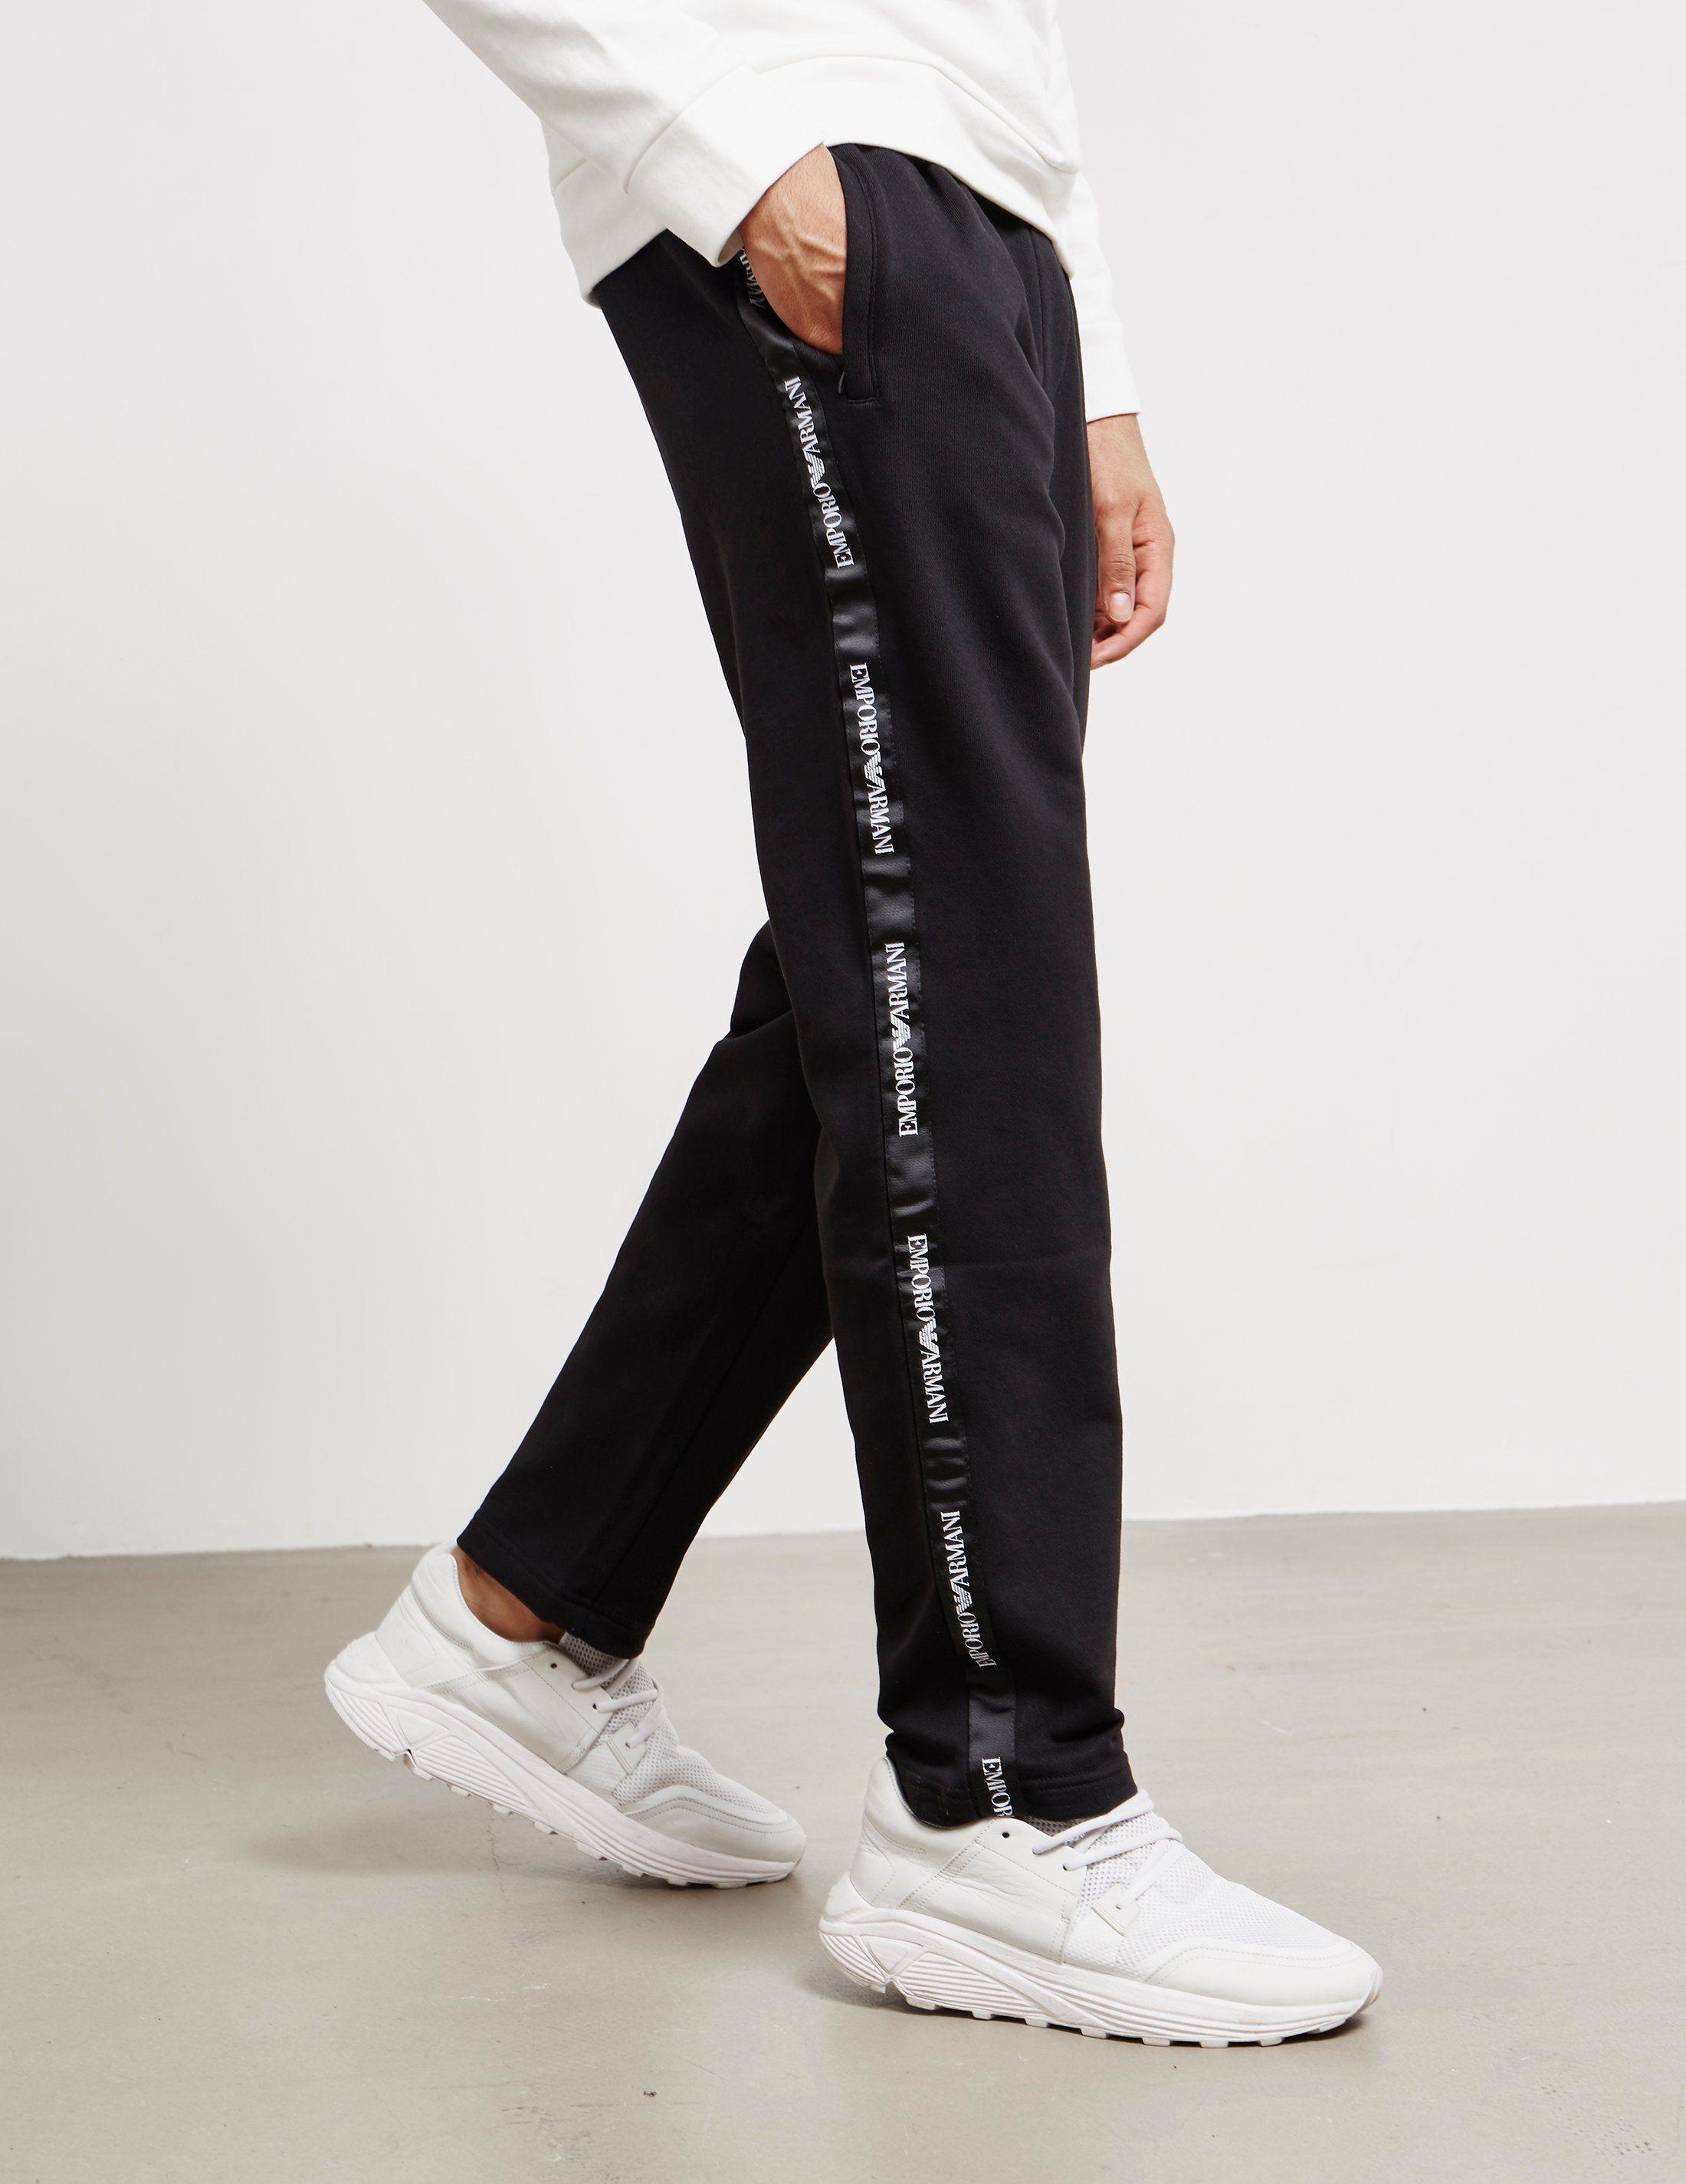 Emporio Armani Tape Contrast Track Pants